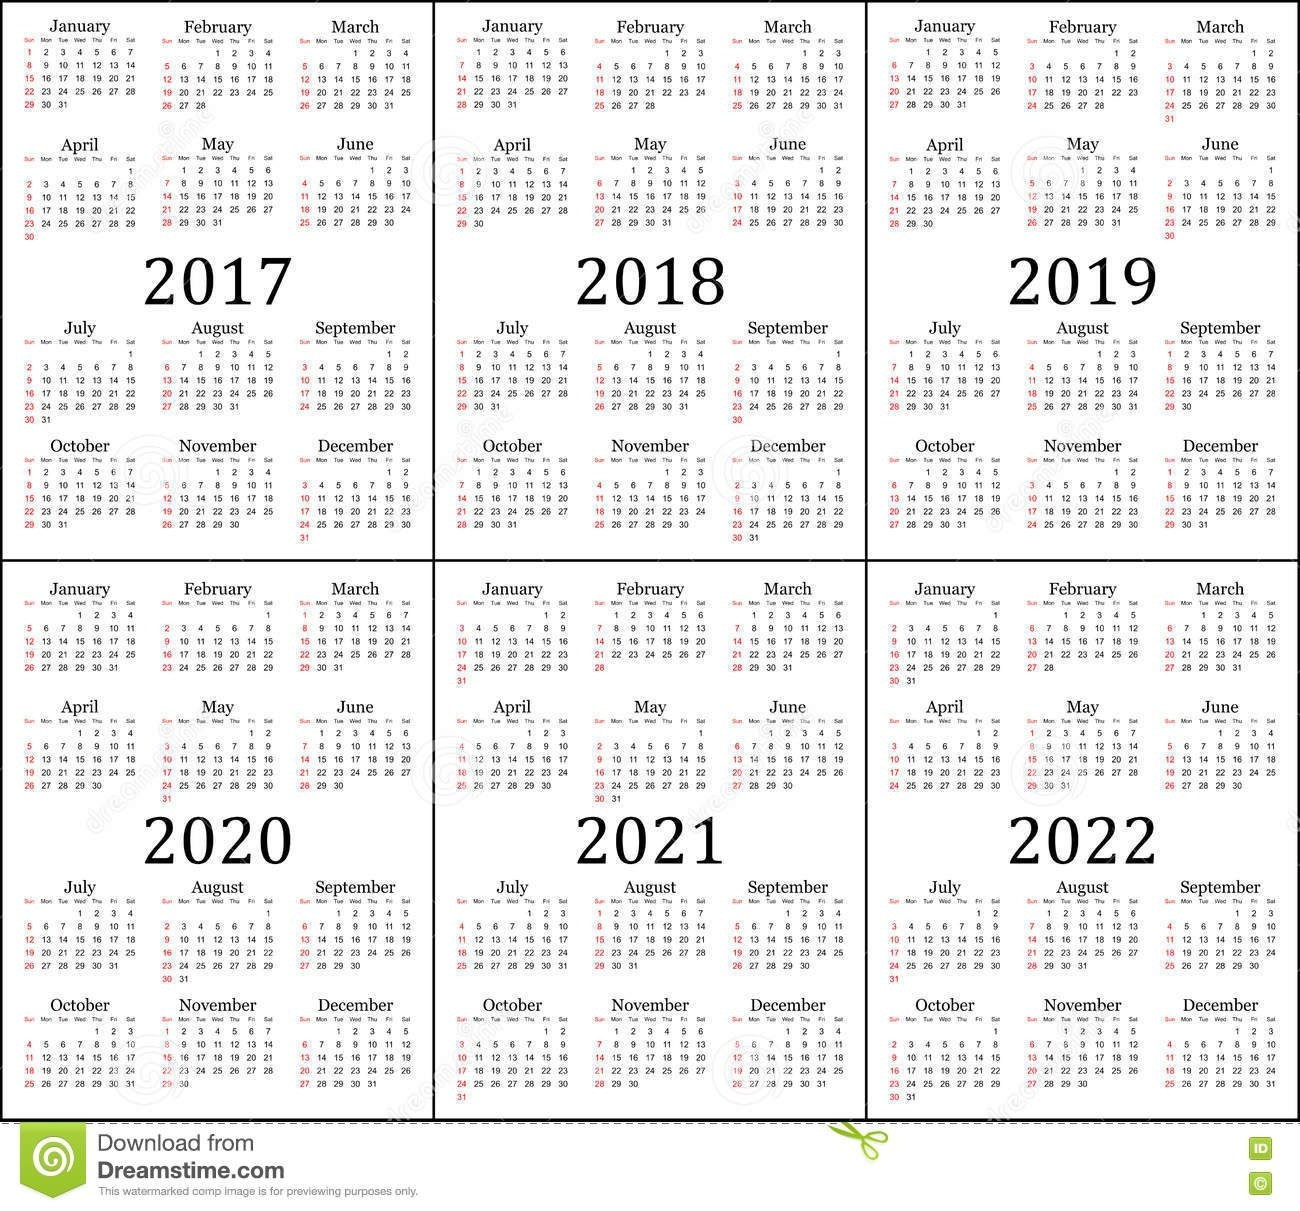 Six Year Calendar - 2017, 2018, 2019, 2020, 2021 And 2022 Stock Calendar 2019 Kolkata